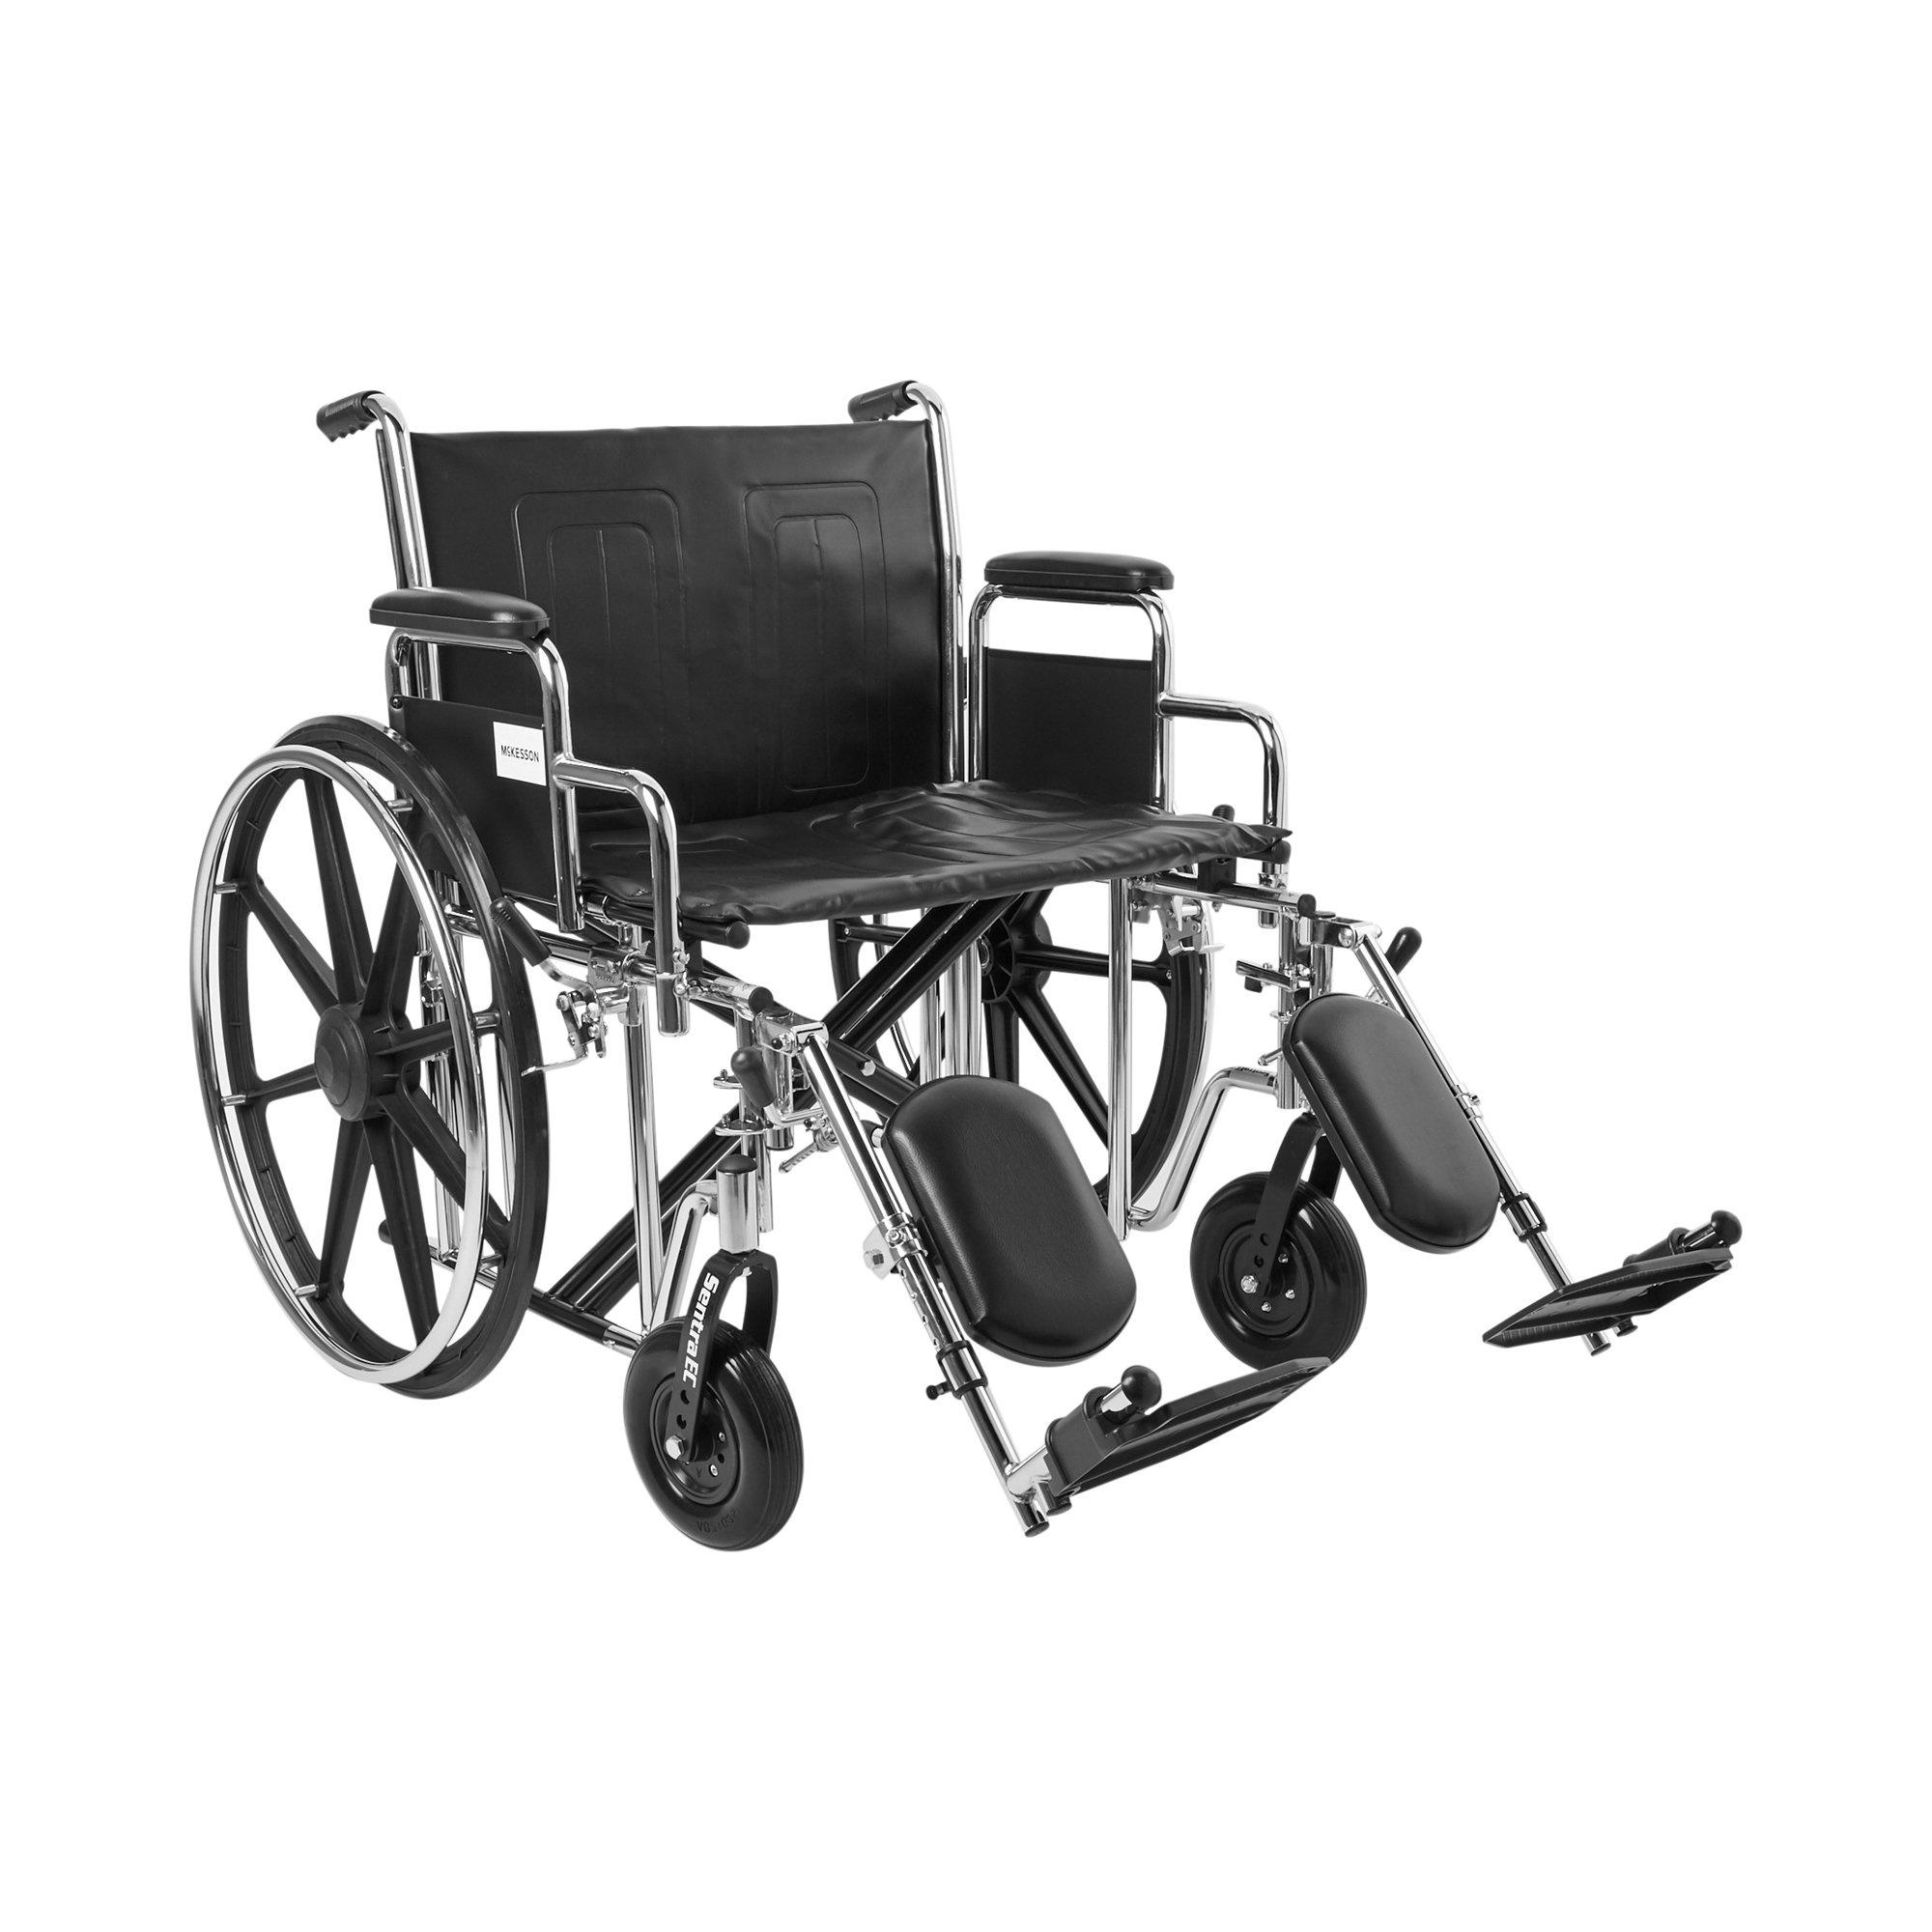 "McKesson Bariatric Wheelchair with Swing-Away Elevating Legrest, 146-STD24ECDDA-ELR, 24"" Seat - 1 Each"